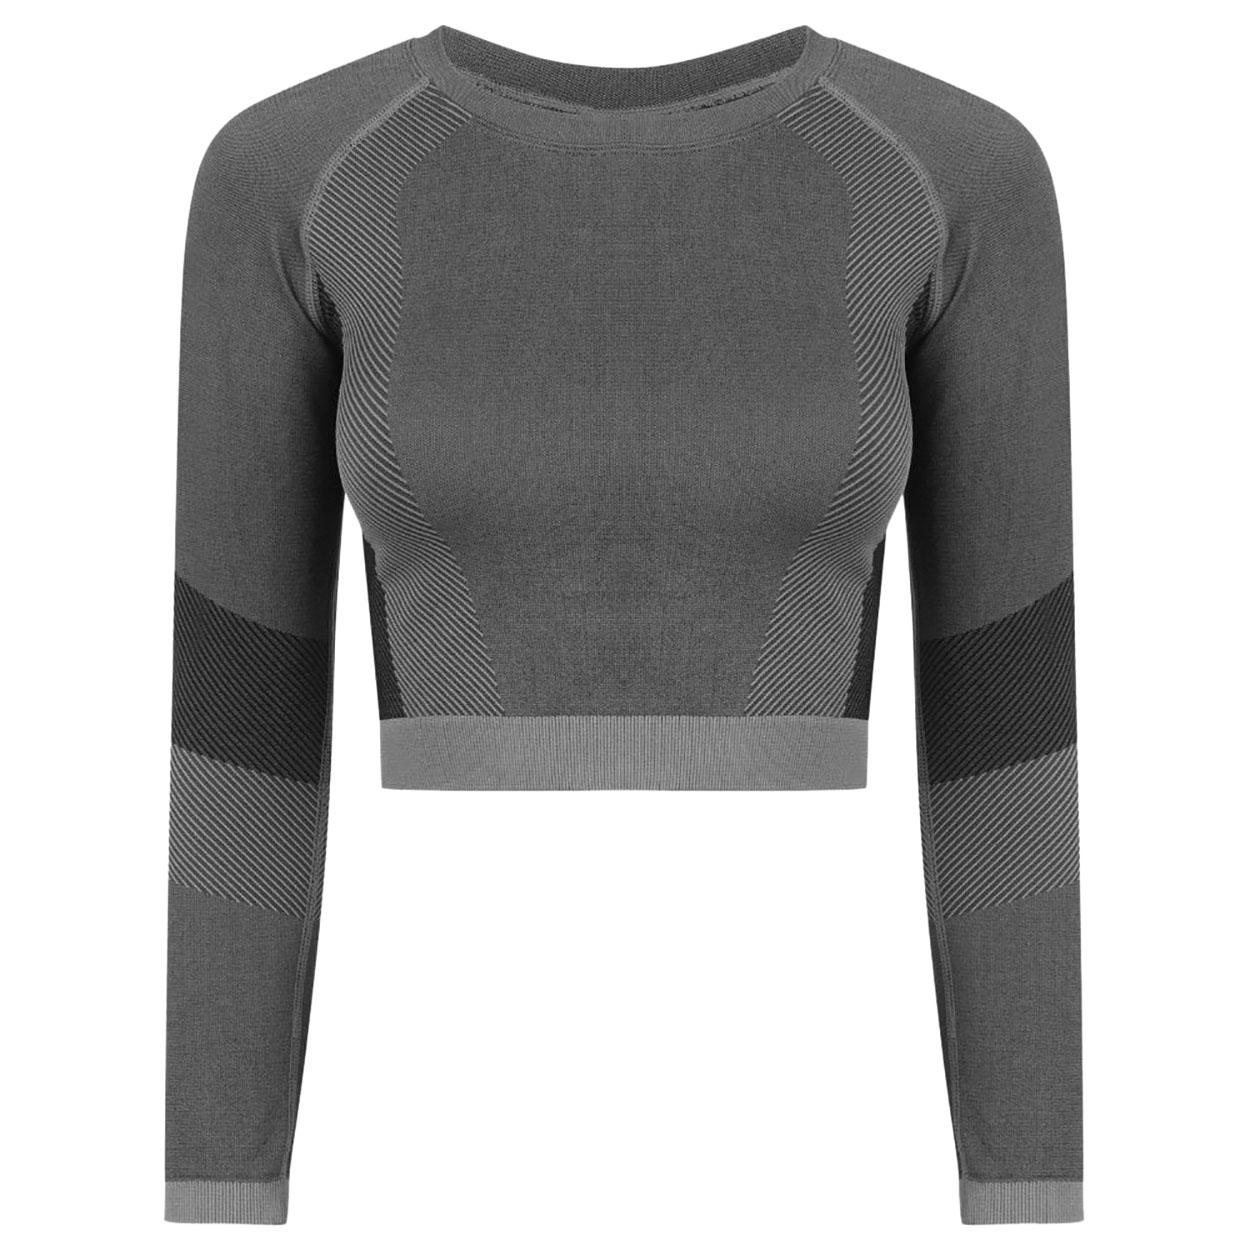 Tombo Womens/Ladies Seamless Panelled Long Sleeve Crop Top (XXL/3XL) (Light Grey/Black)